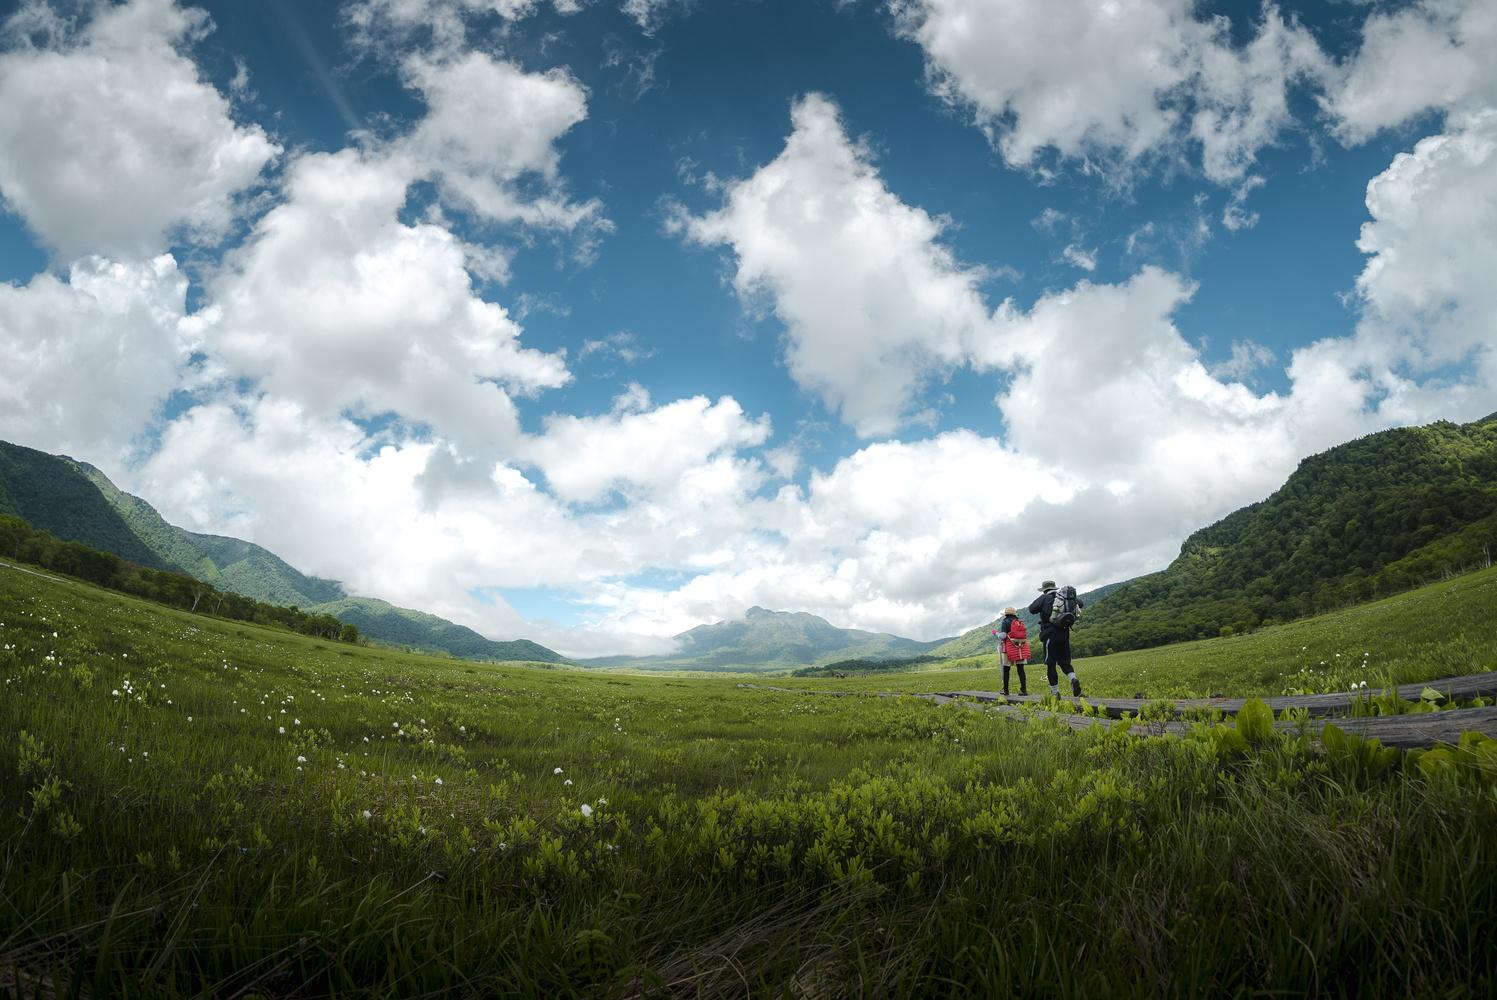 Faraway Land by Yuandong Li